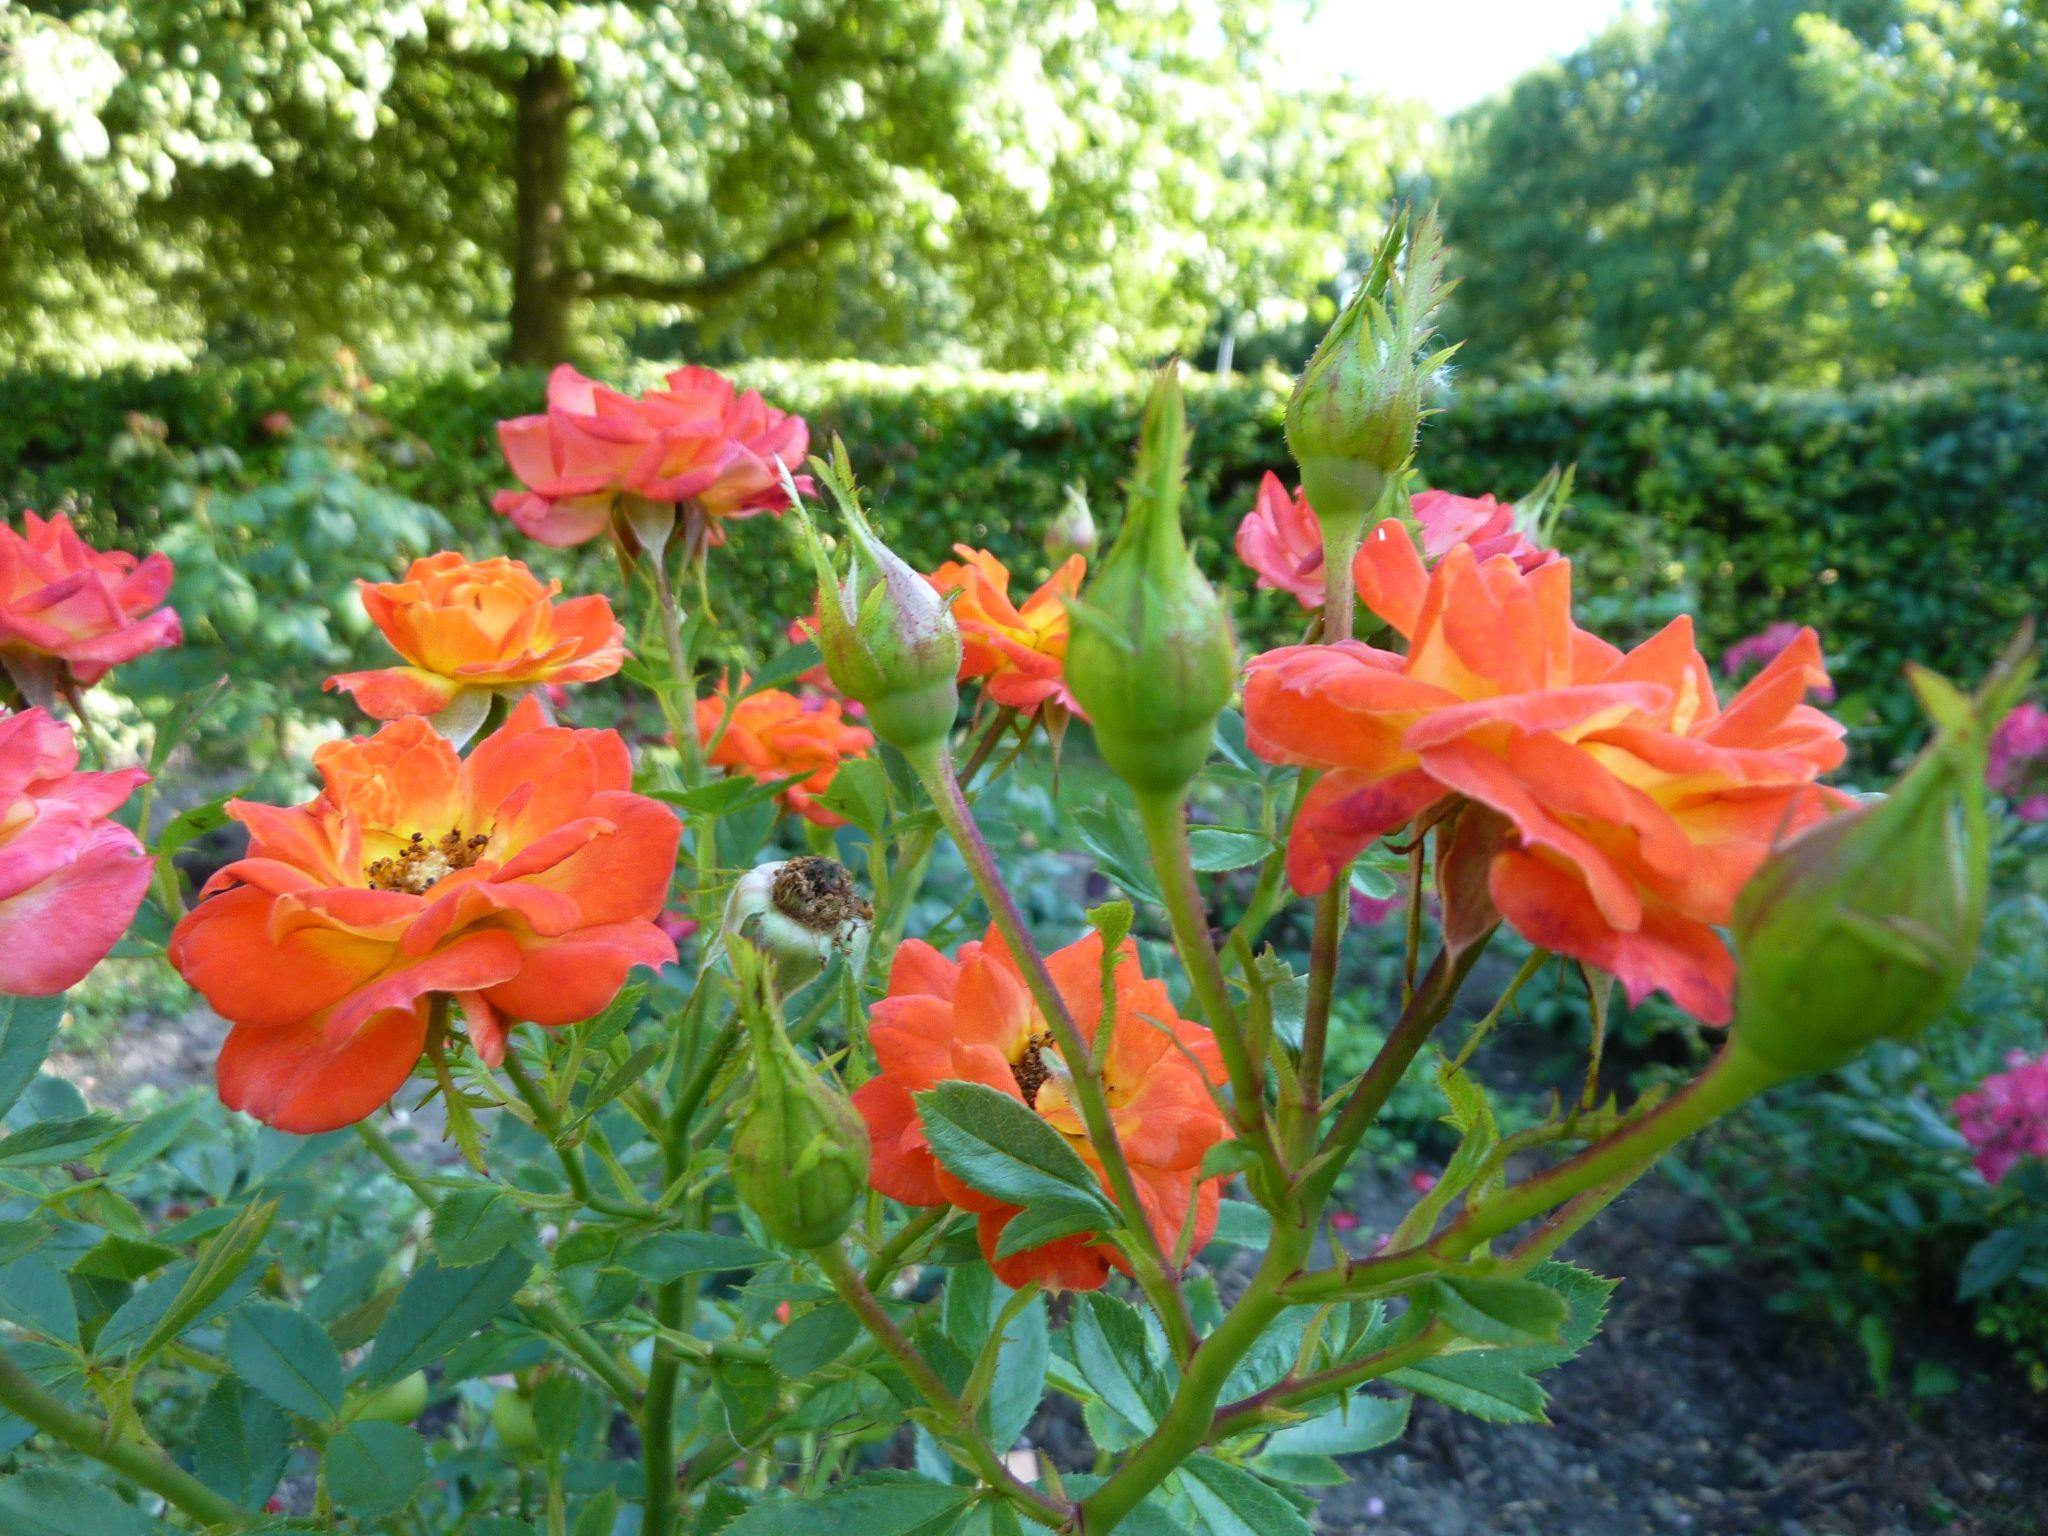 ~Roses at the flowergarden, Het Eksternest in Almere~